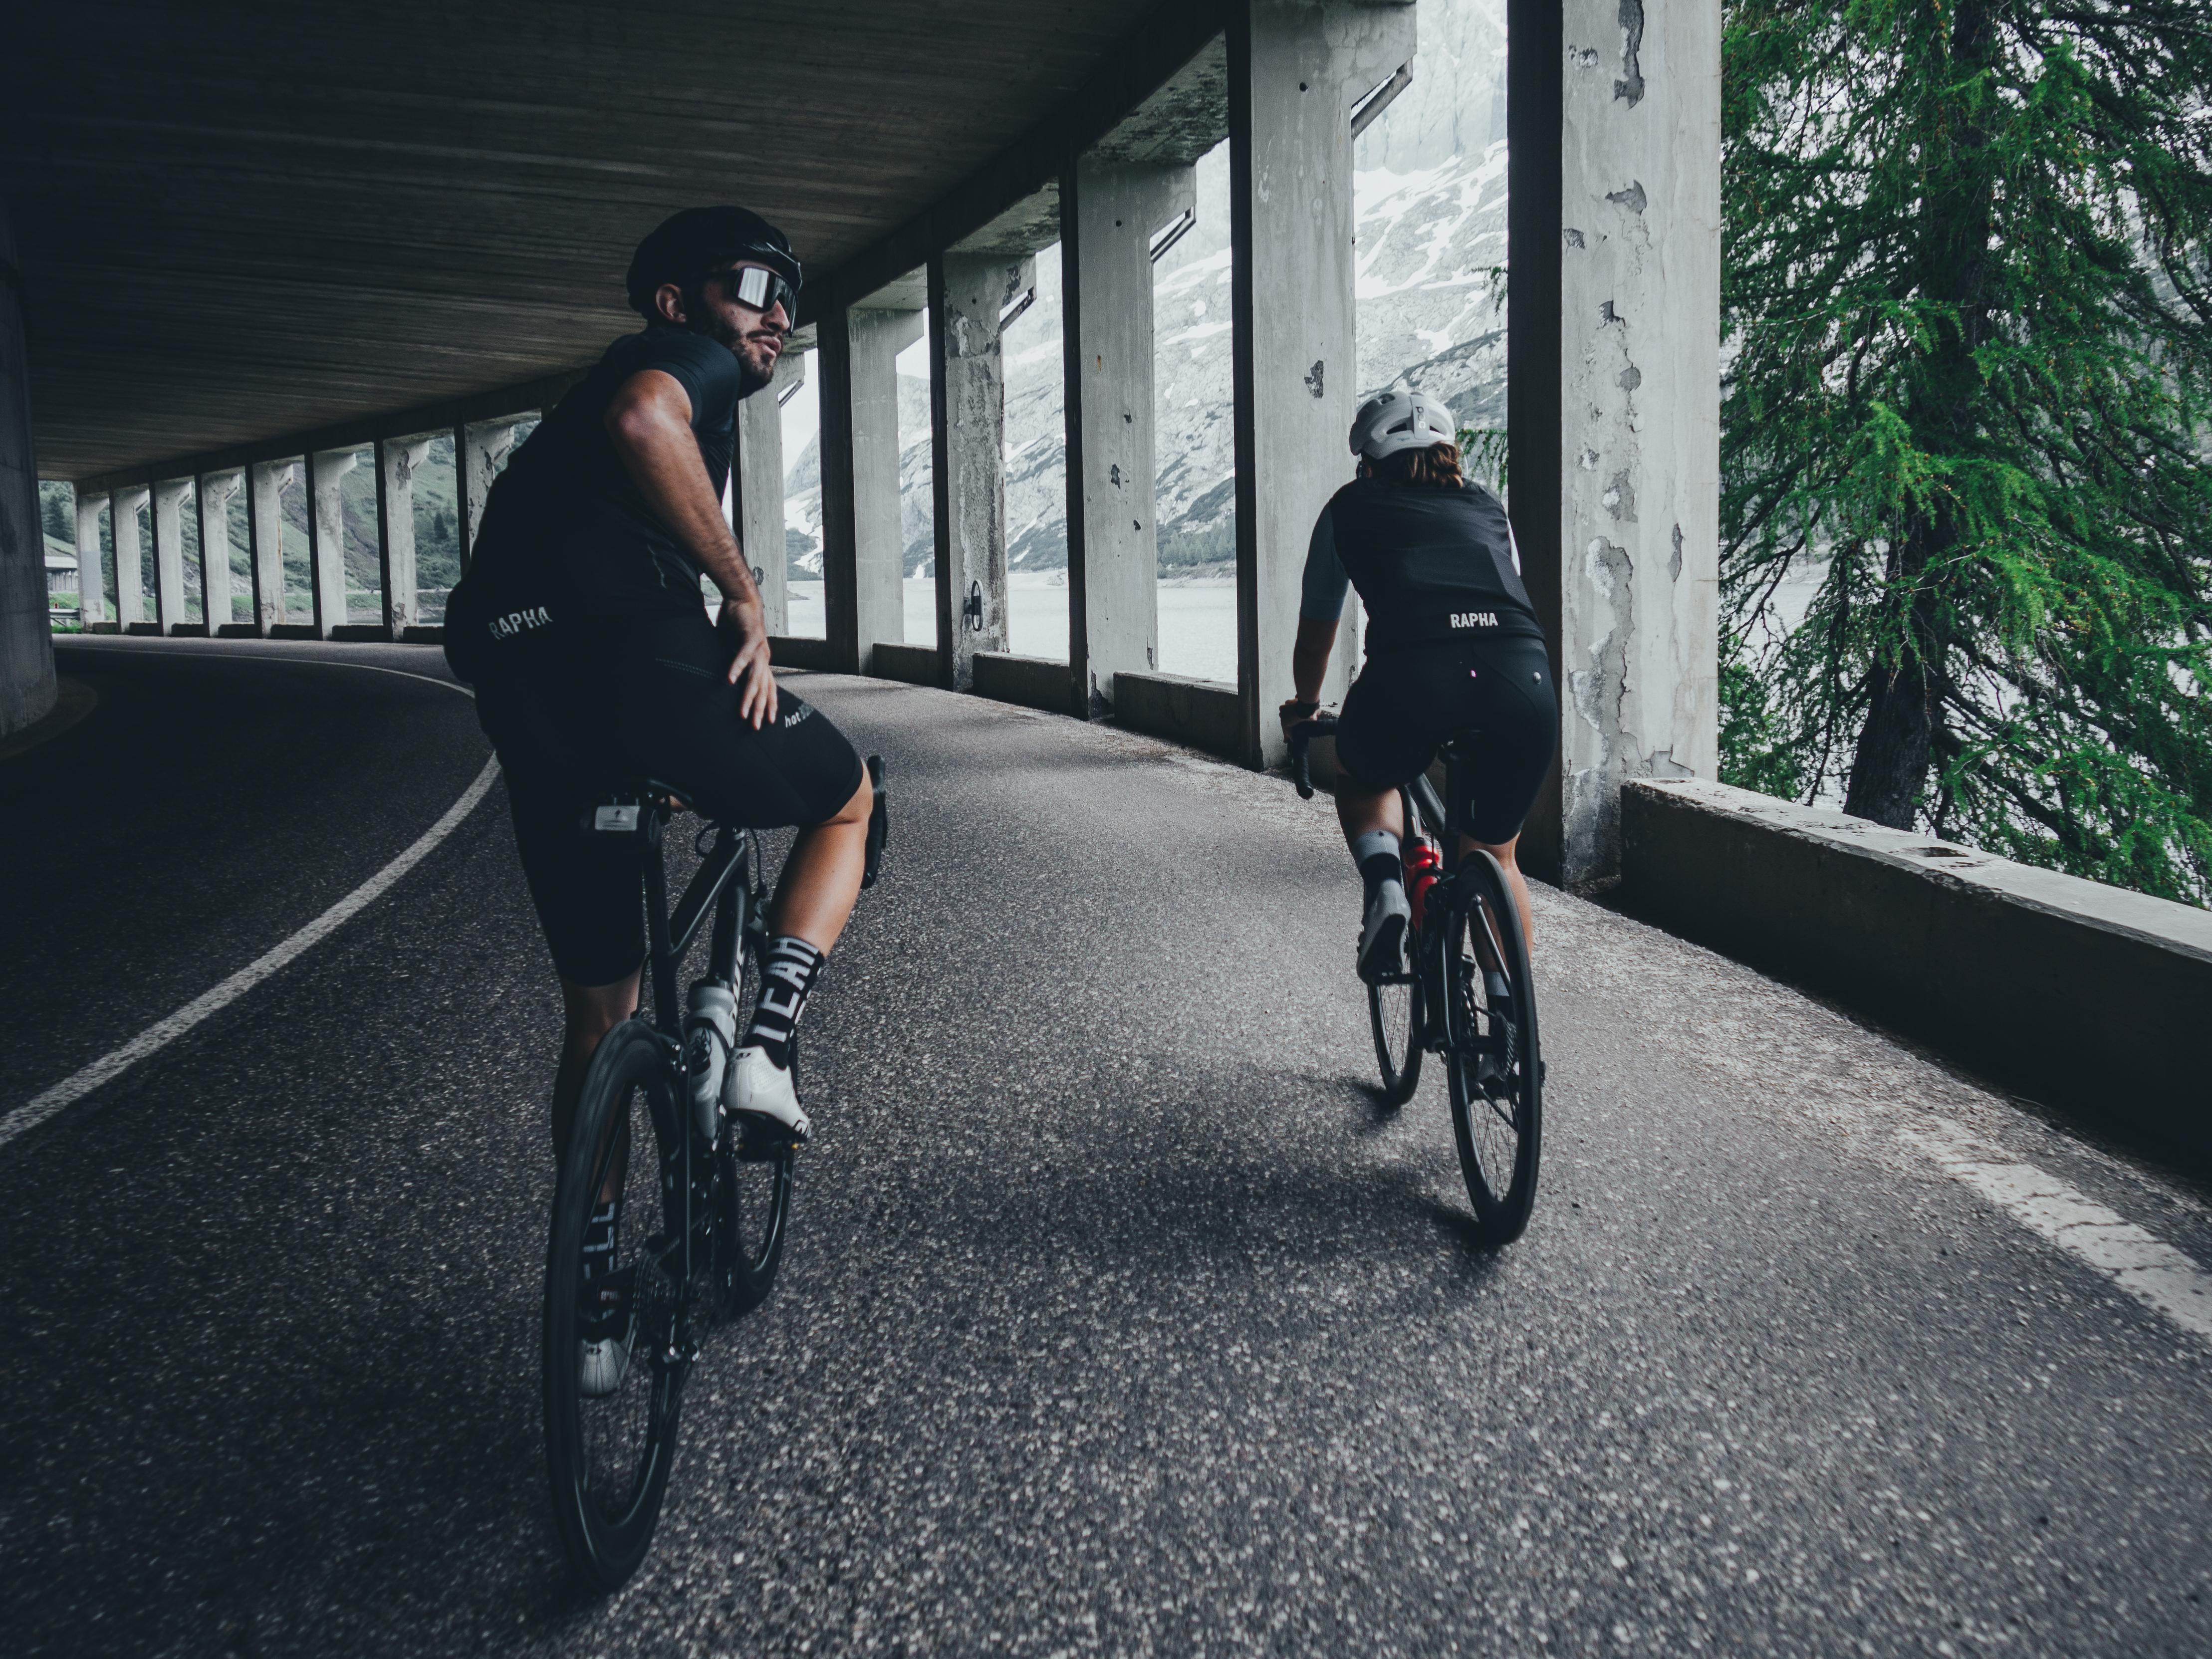 Dolomiten, Routentipps, Passo Fedaia, Sella Ronda, Hotel Melodia Del Bosco, Panorama, Rennrad, Rennradblog, Roadbike Holidays